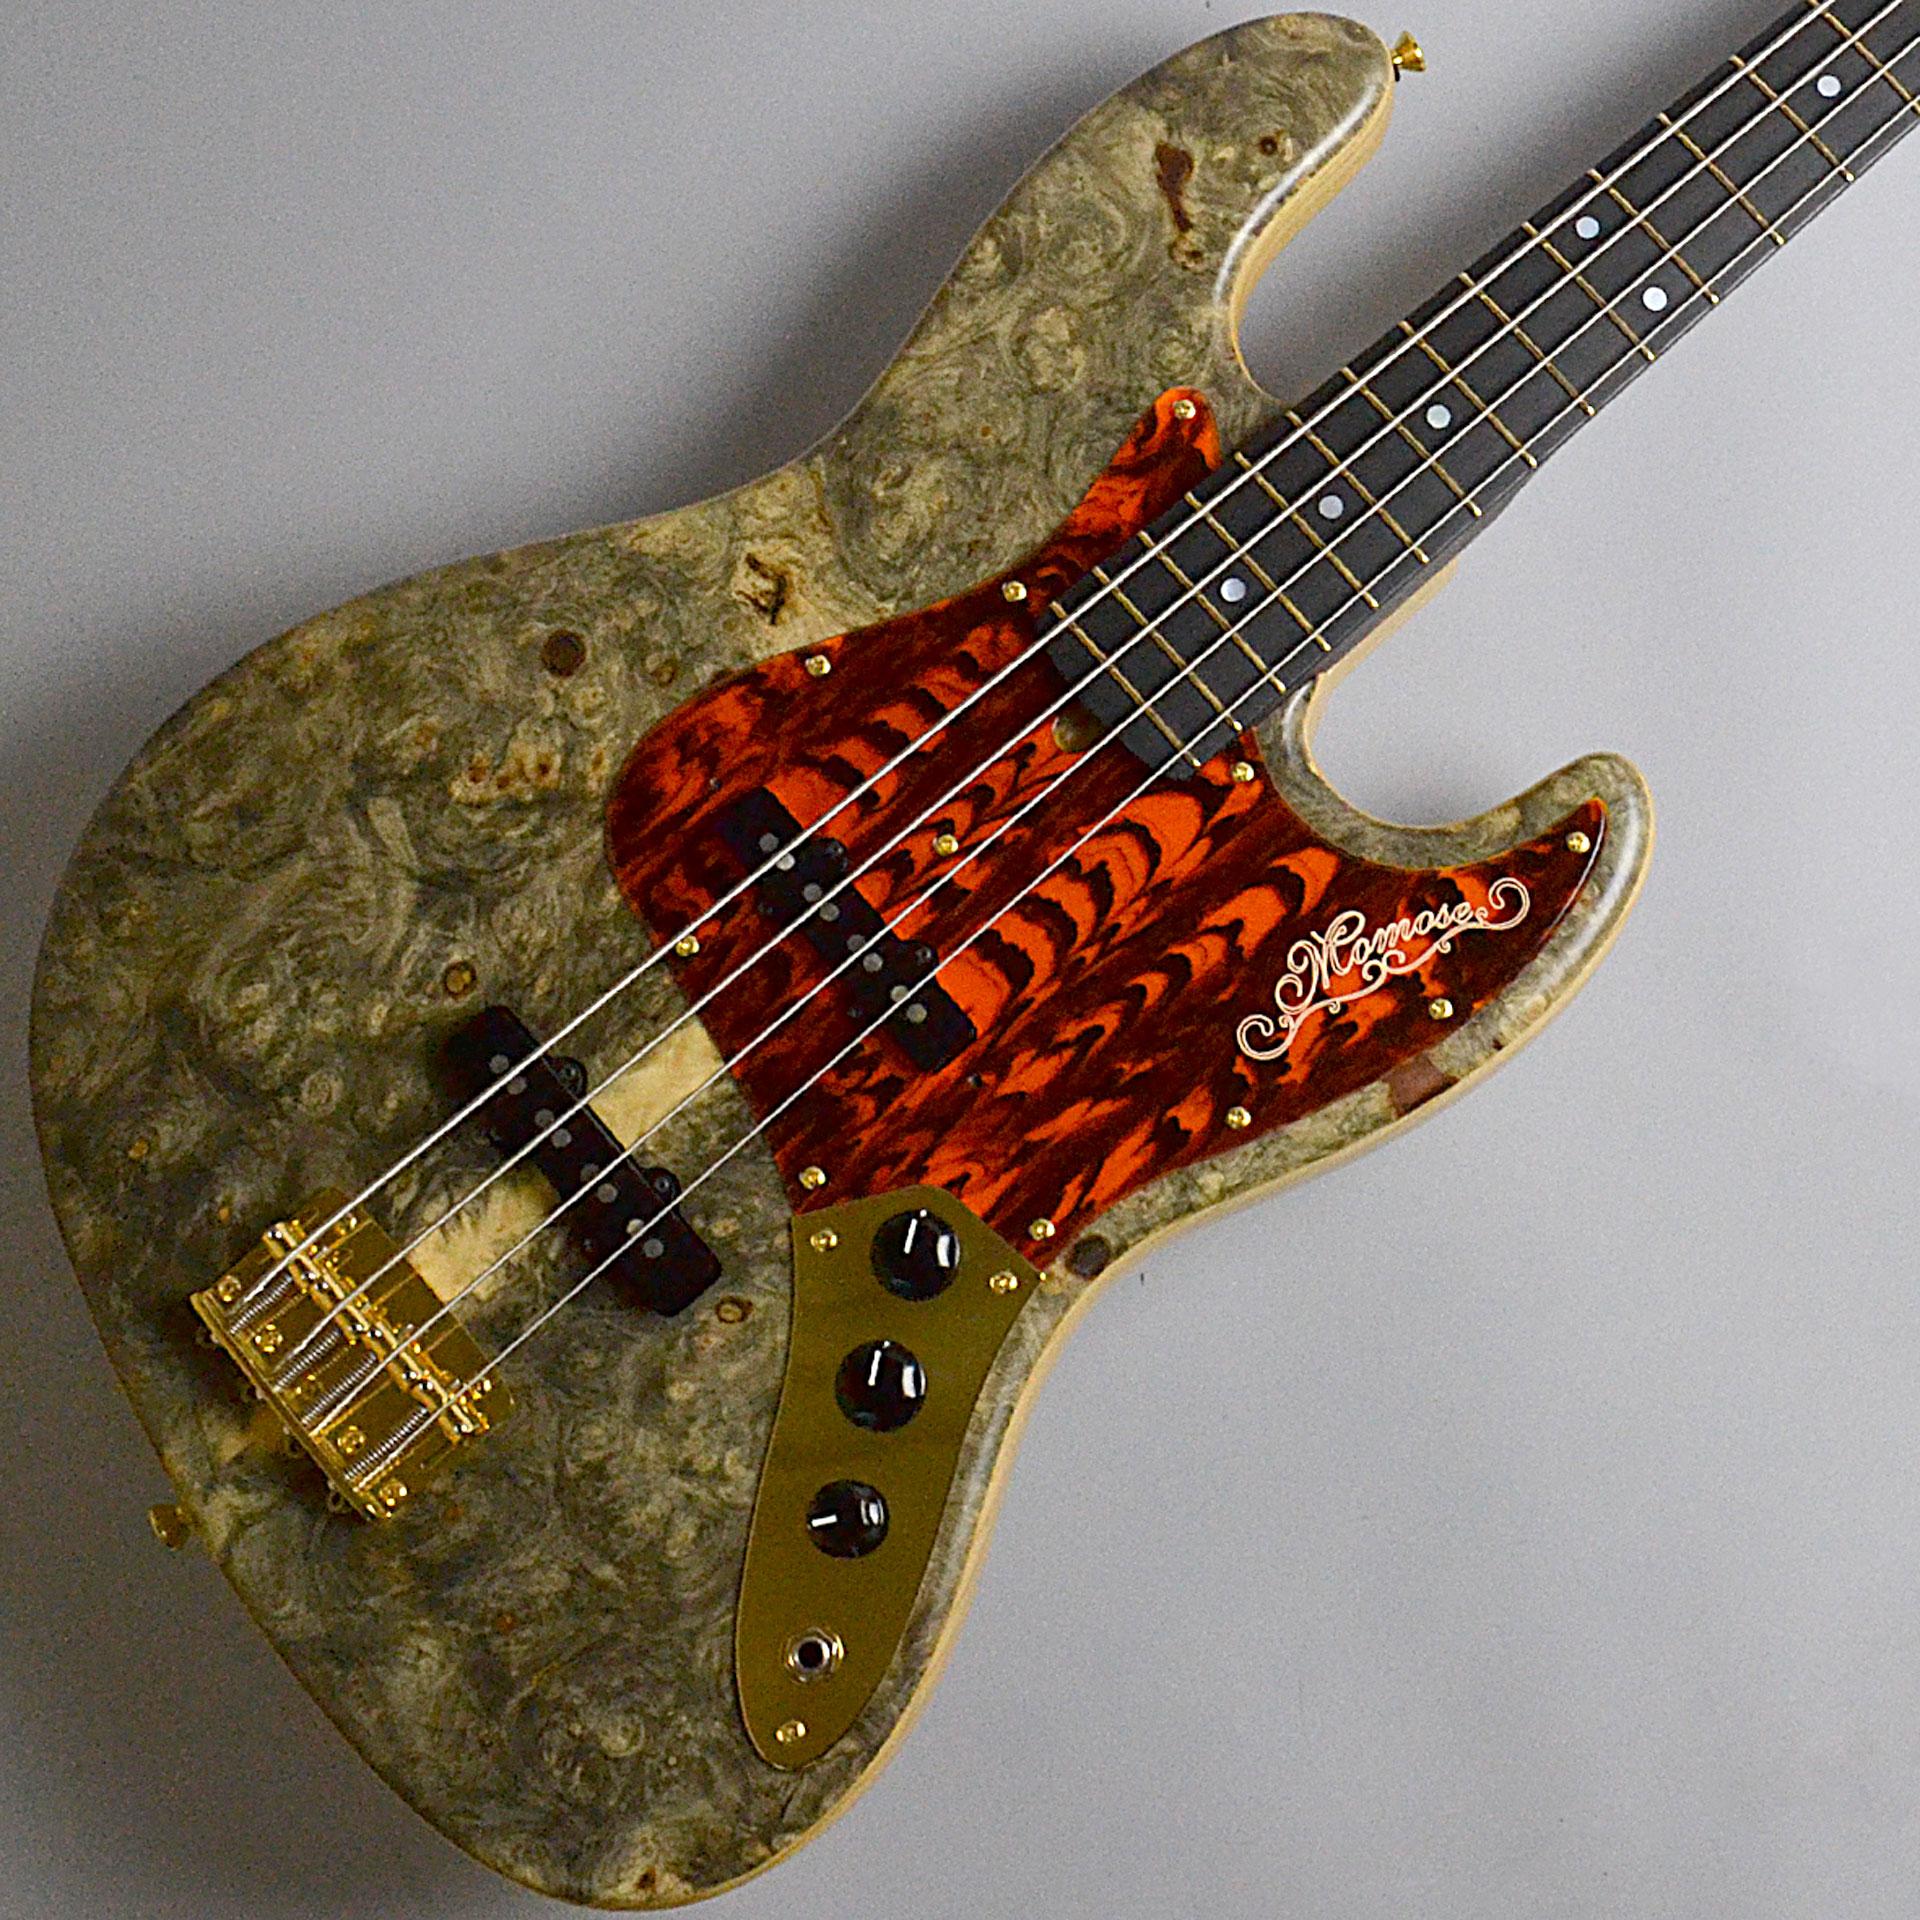 MJB2-BW PRM 楽器フェア限定モデル